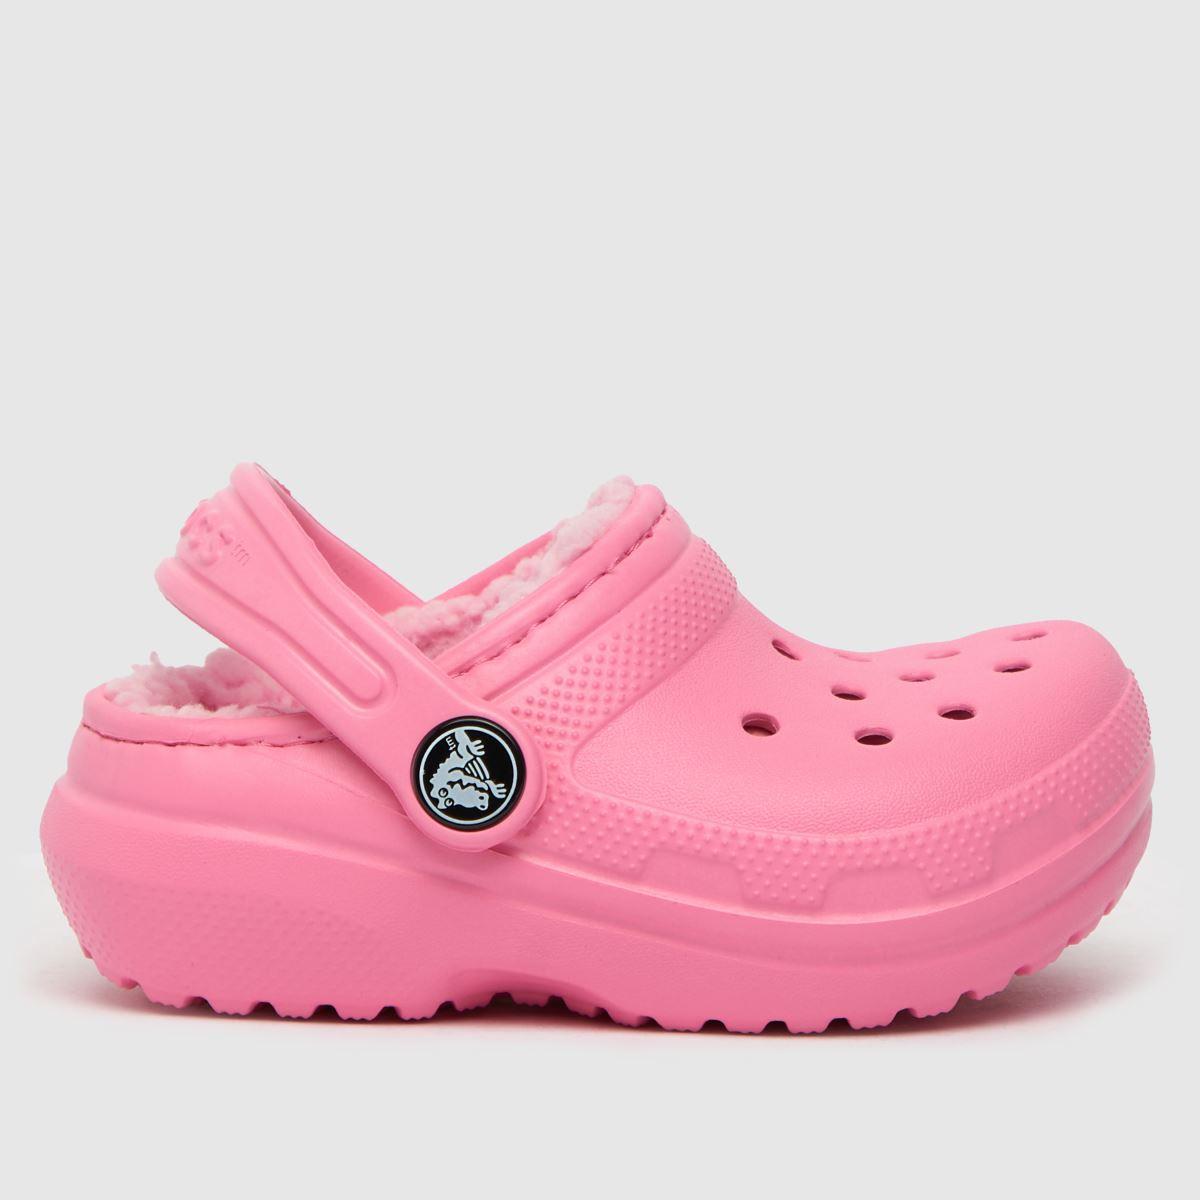 Crocs Pale Pink Classic Lined Clog Sandals Junior